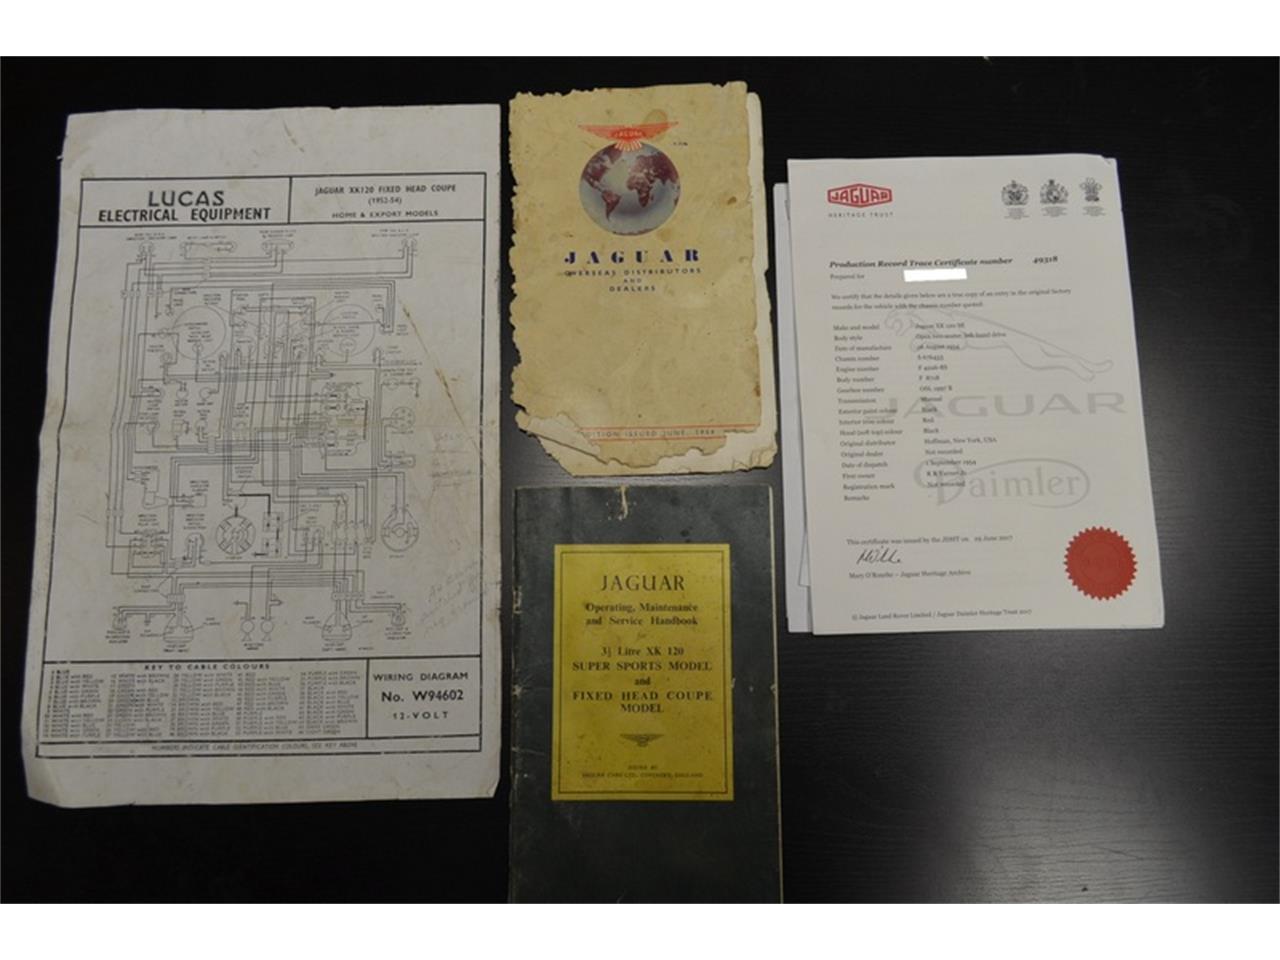 1954 Jaguar Wiring Diagram Schematics Willys Xk120 For Sale Classiccars Com Cc 1071922 Fender Guitar